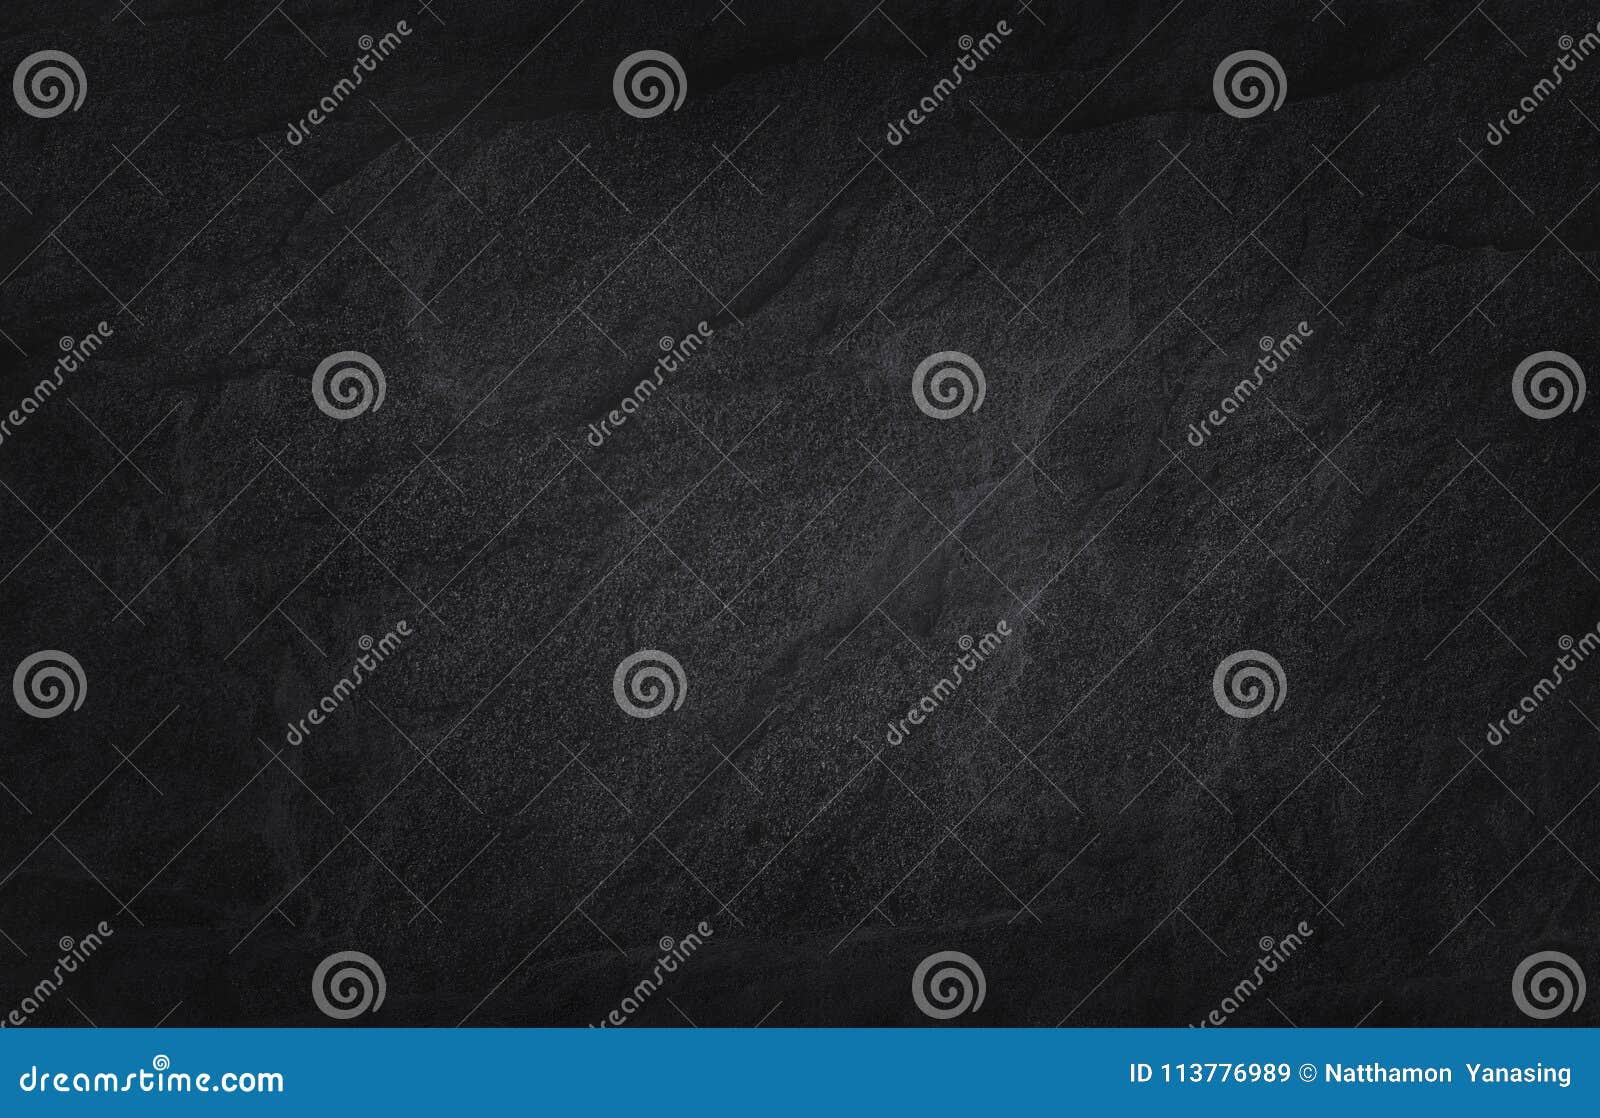 Dark grey black slate texture in natural pattern. Black stone wall.